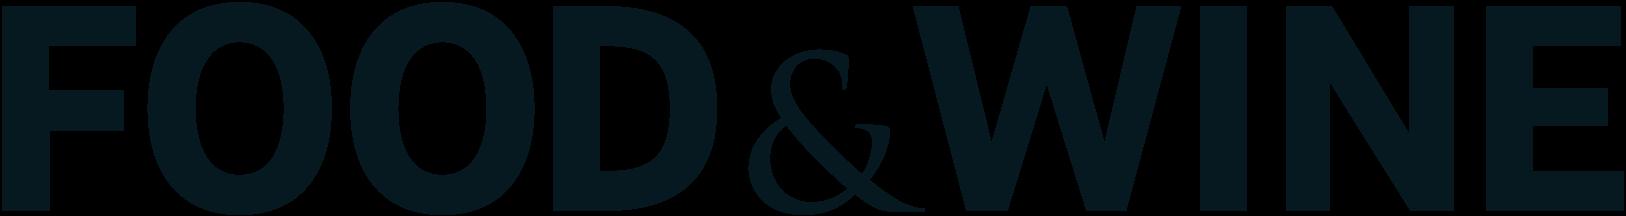 F&W-Logo-4-c-black.png